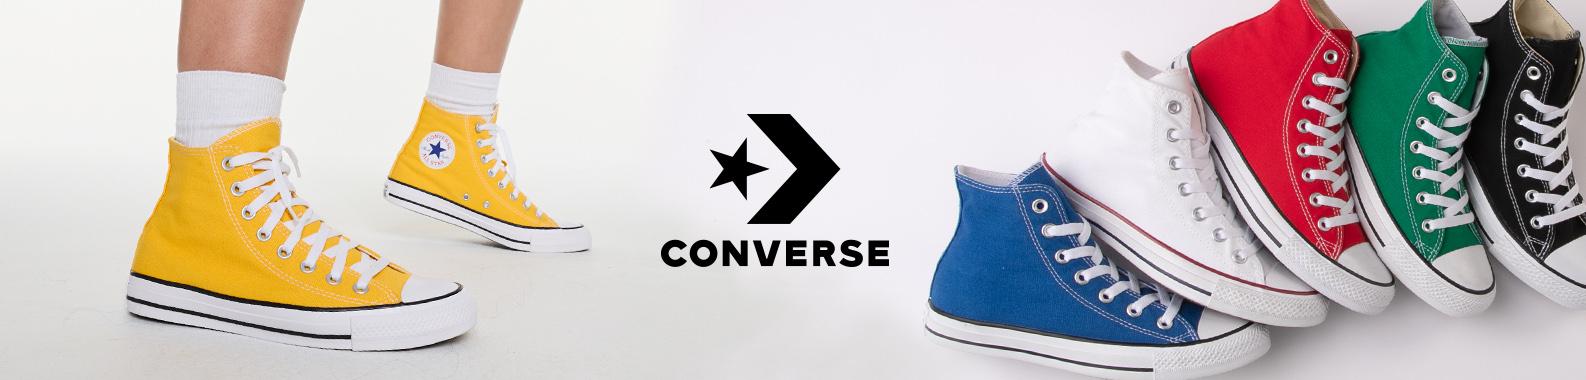 Converse brand header image